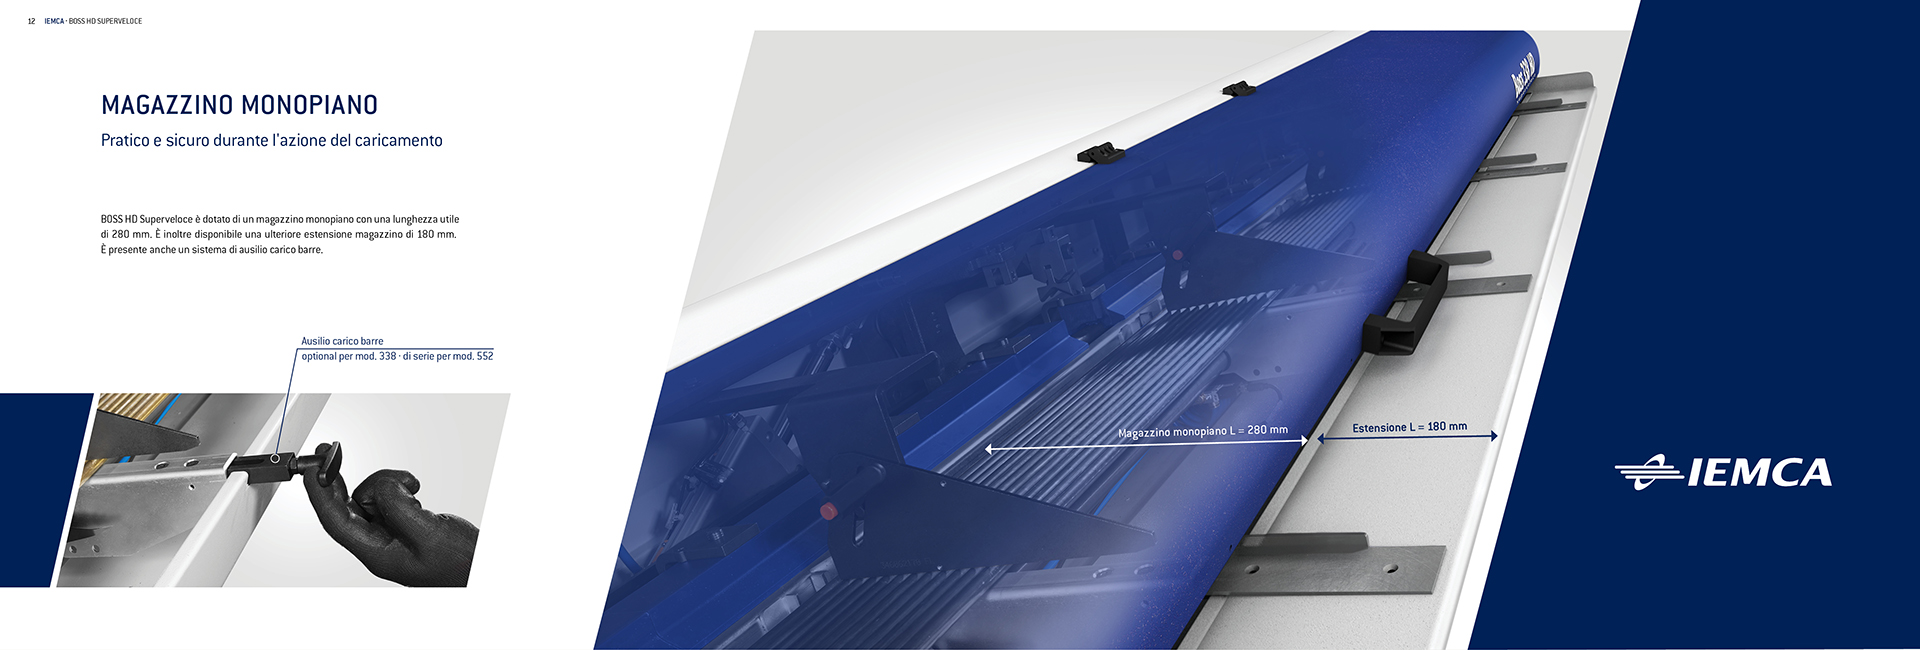 CabrioletStudio-design-comunicazione-iemca